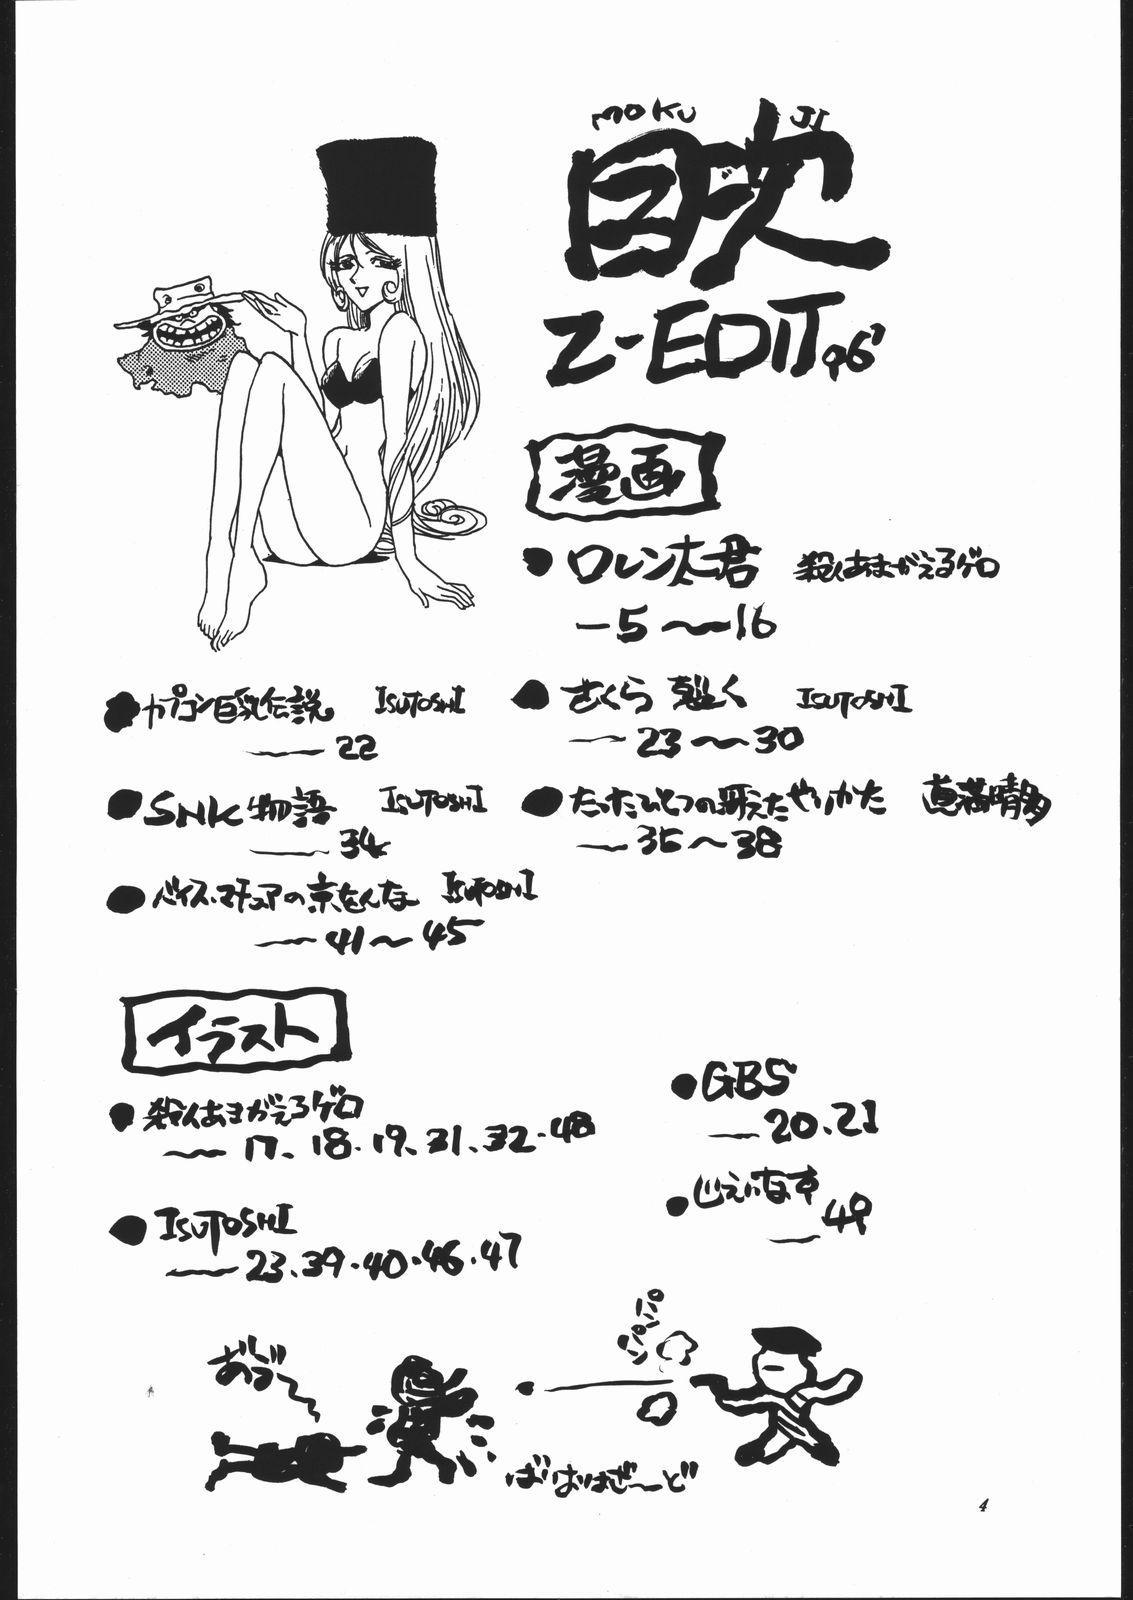 Z-EDIT 2